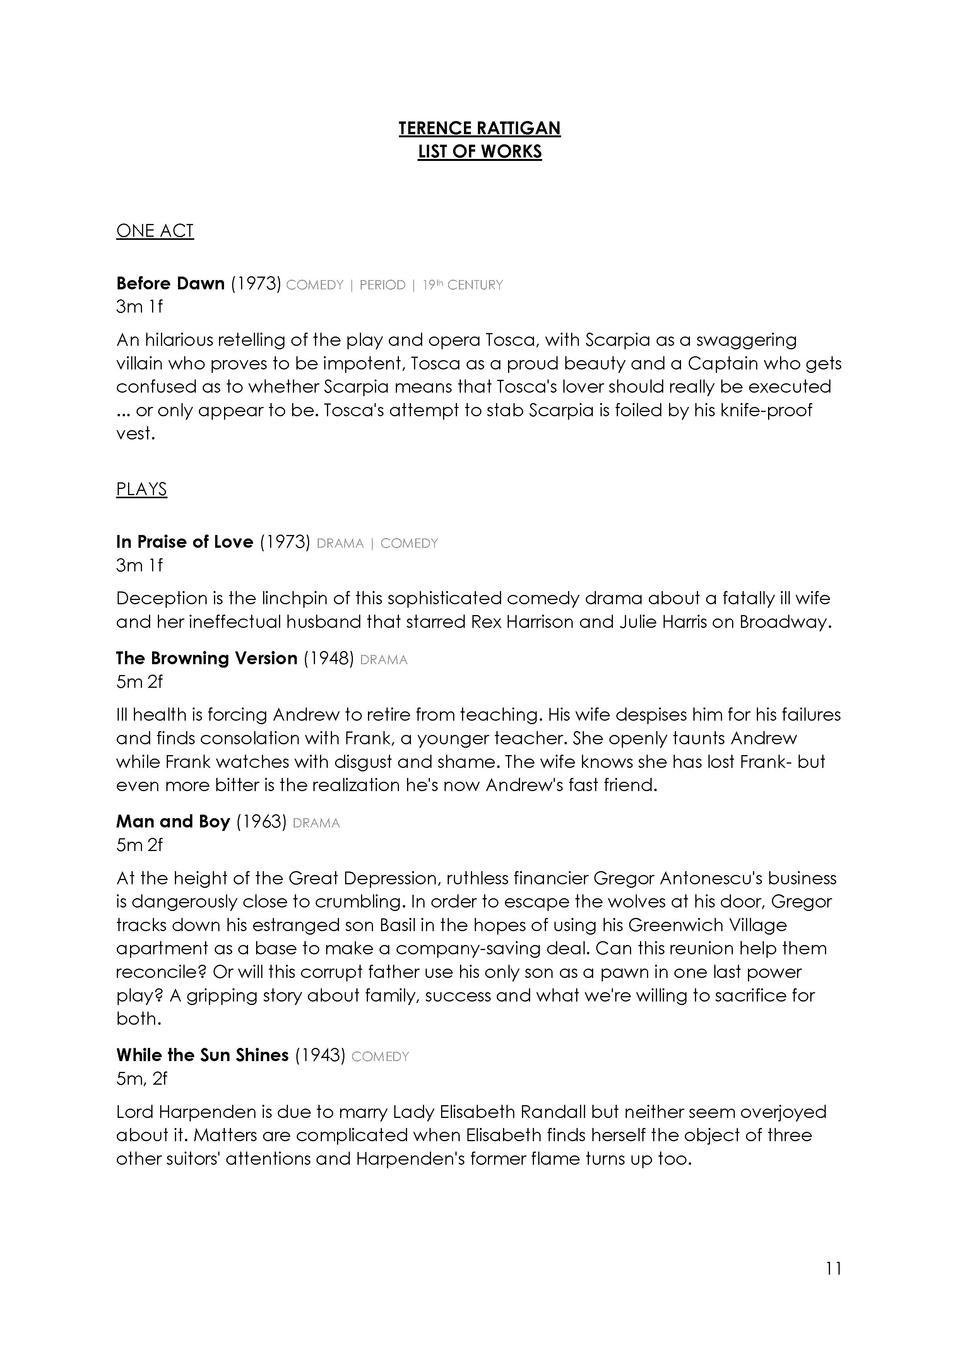 ABR Estates : simplebooklet com